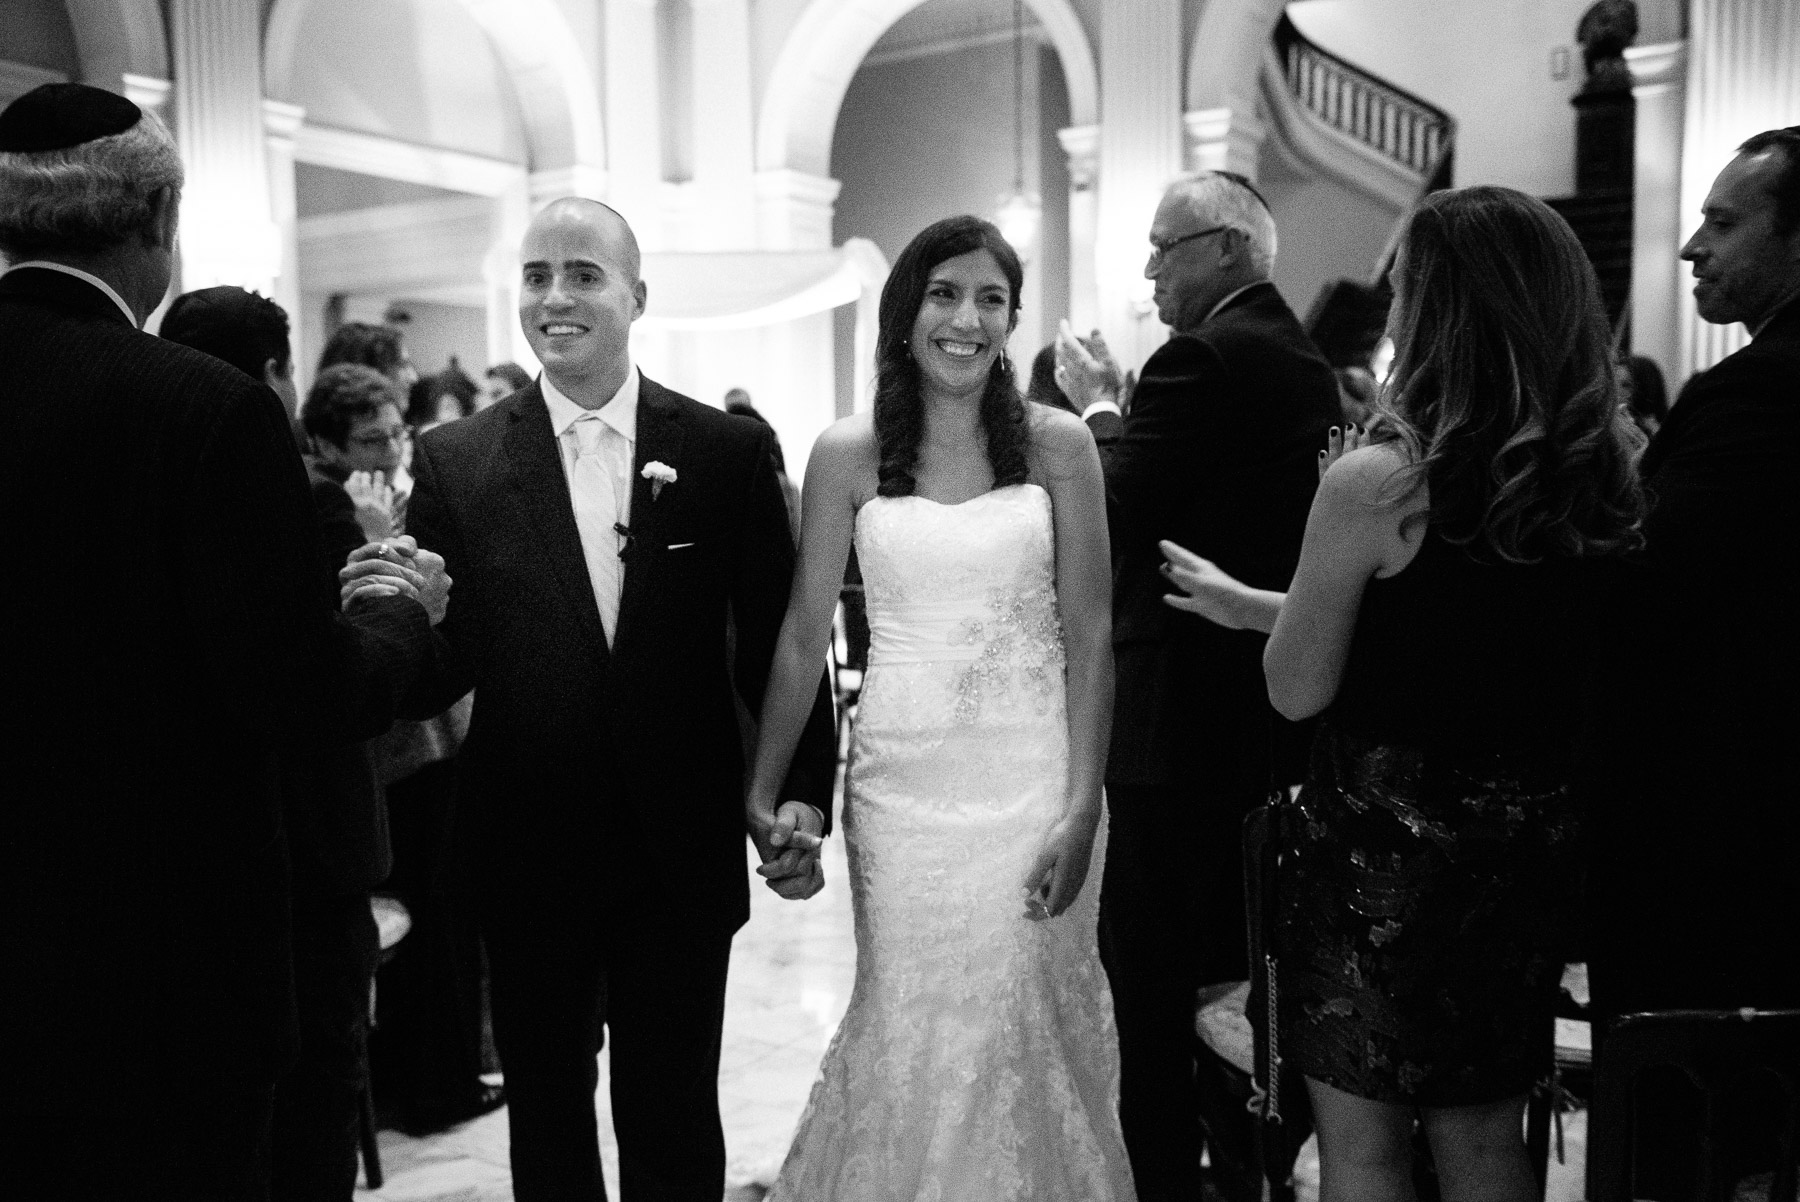 racquet-club-philadelphia-wedding-43.jpg